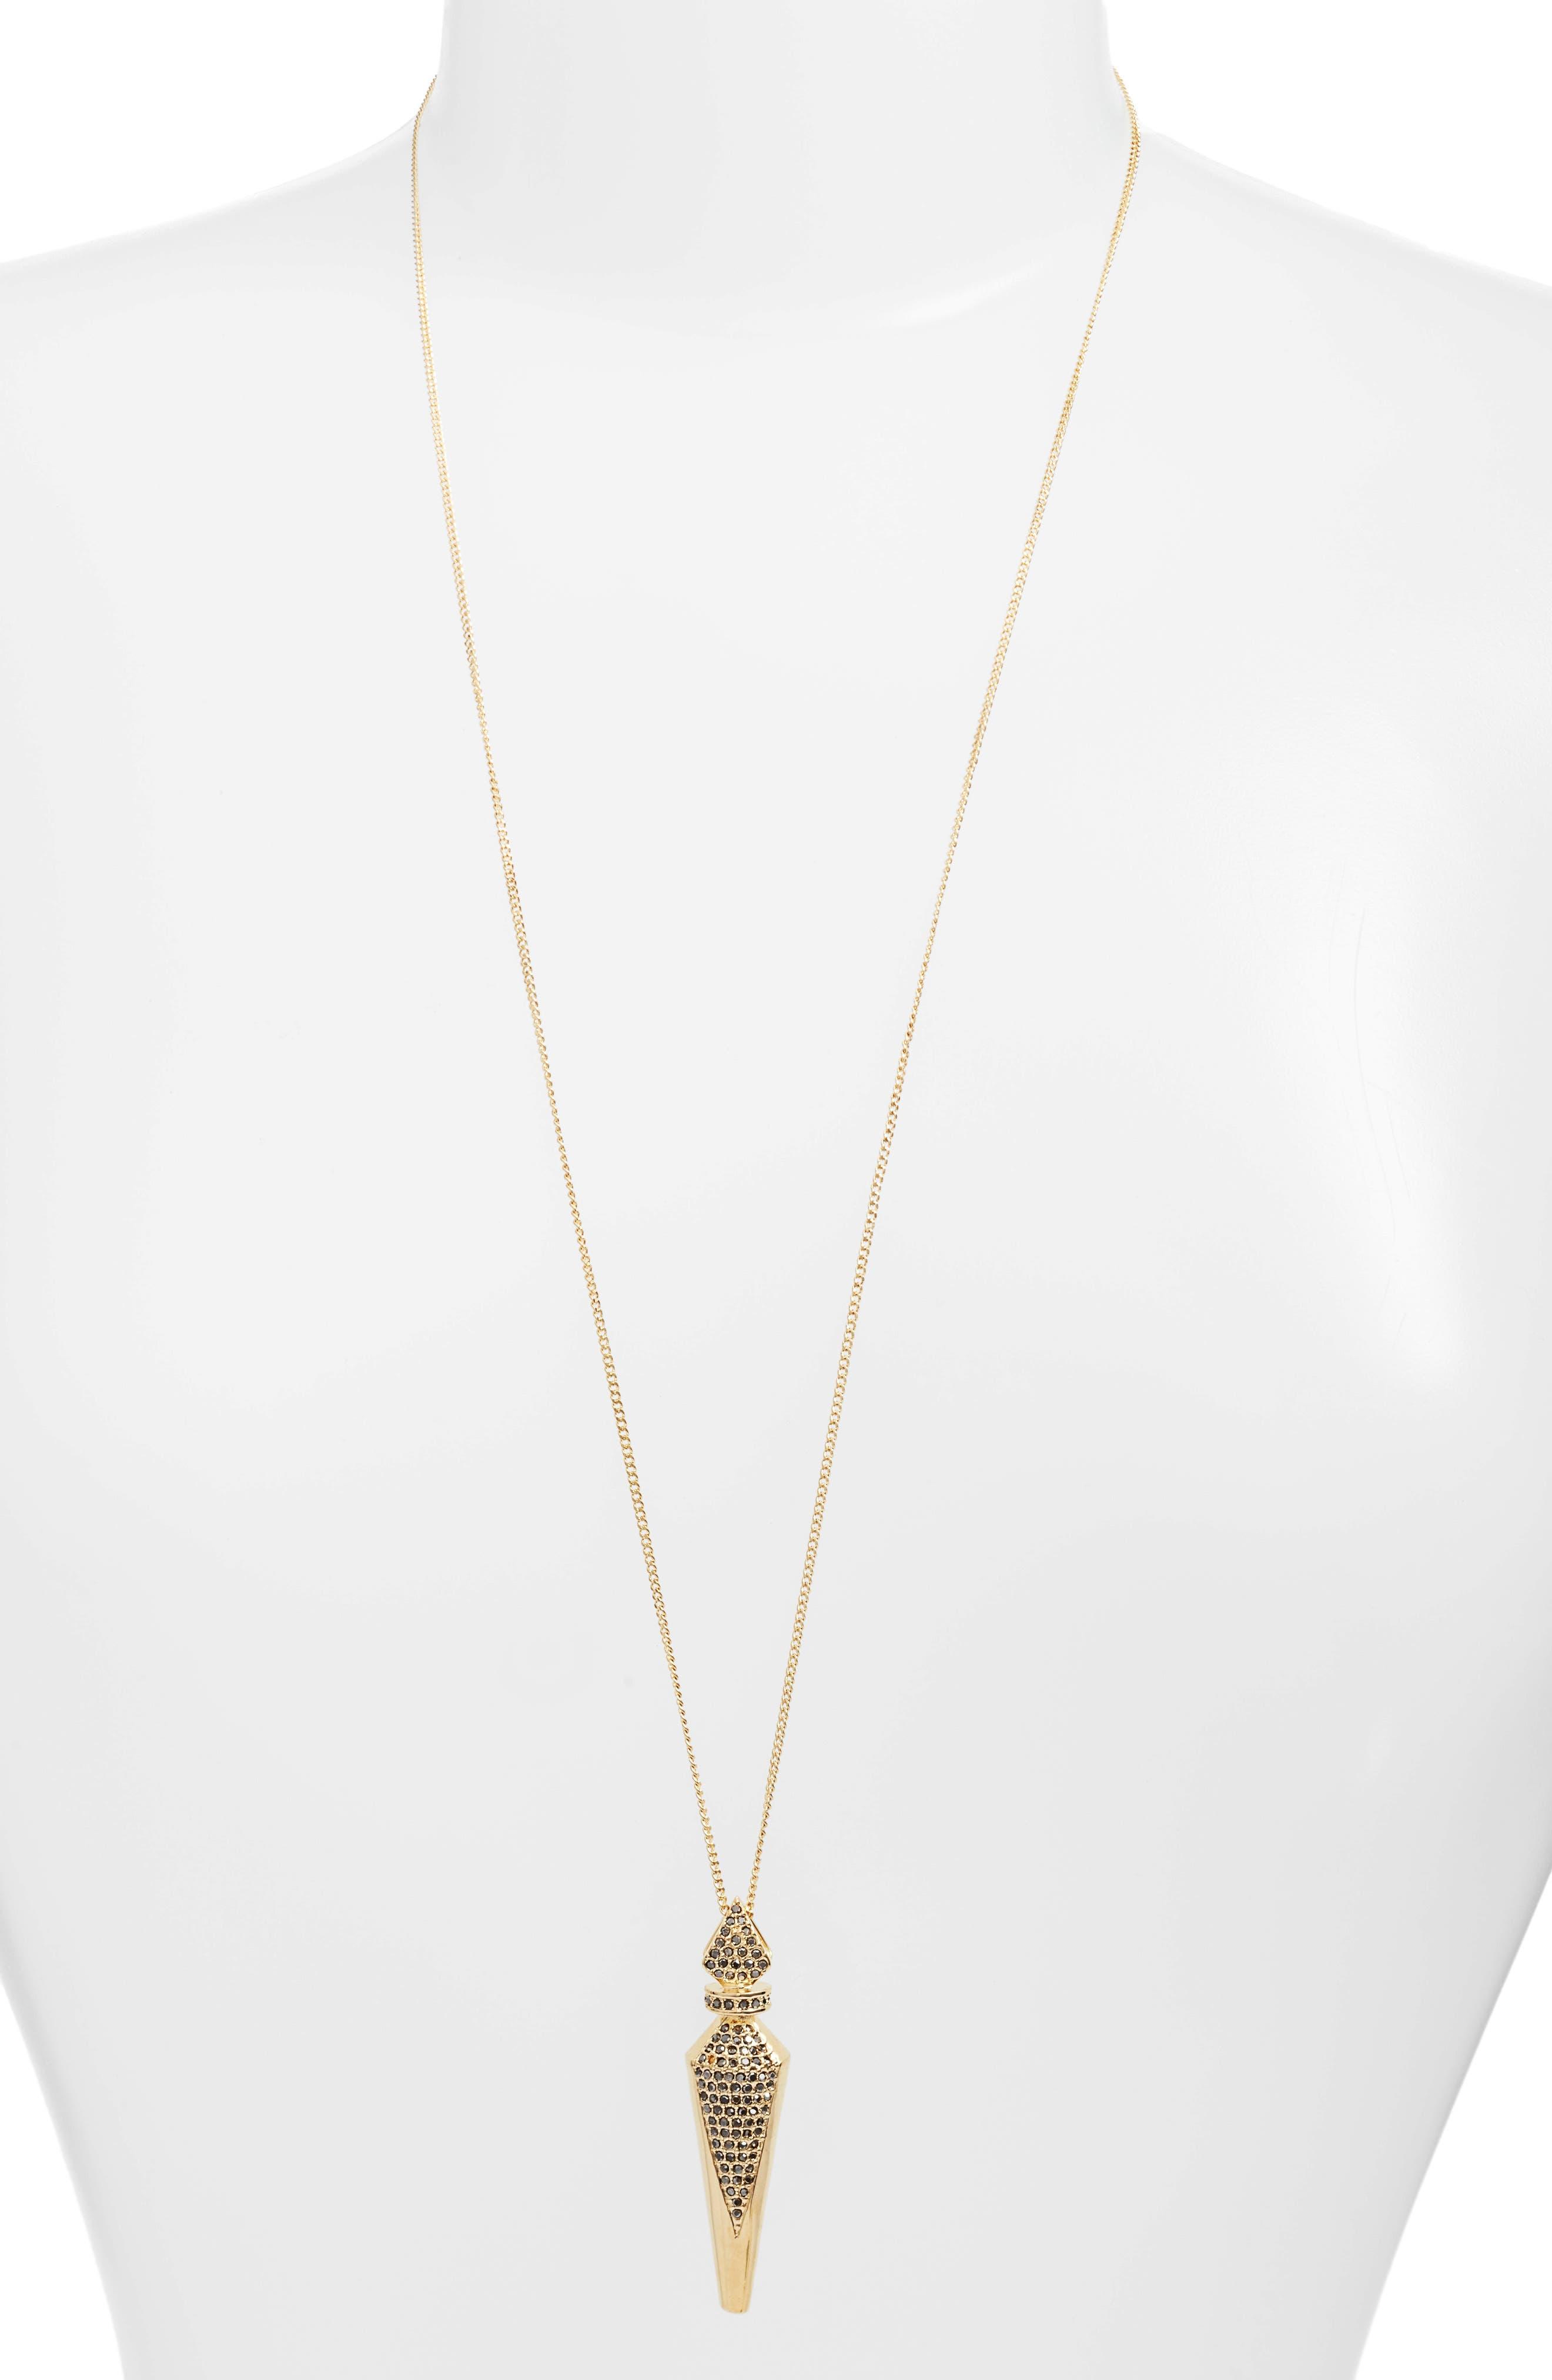 Alternate Image 1 Selected - Vince Camuto Pavé Crystal Pendant Necklace